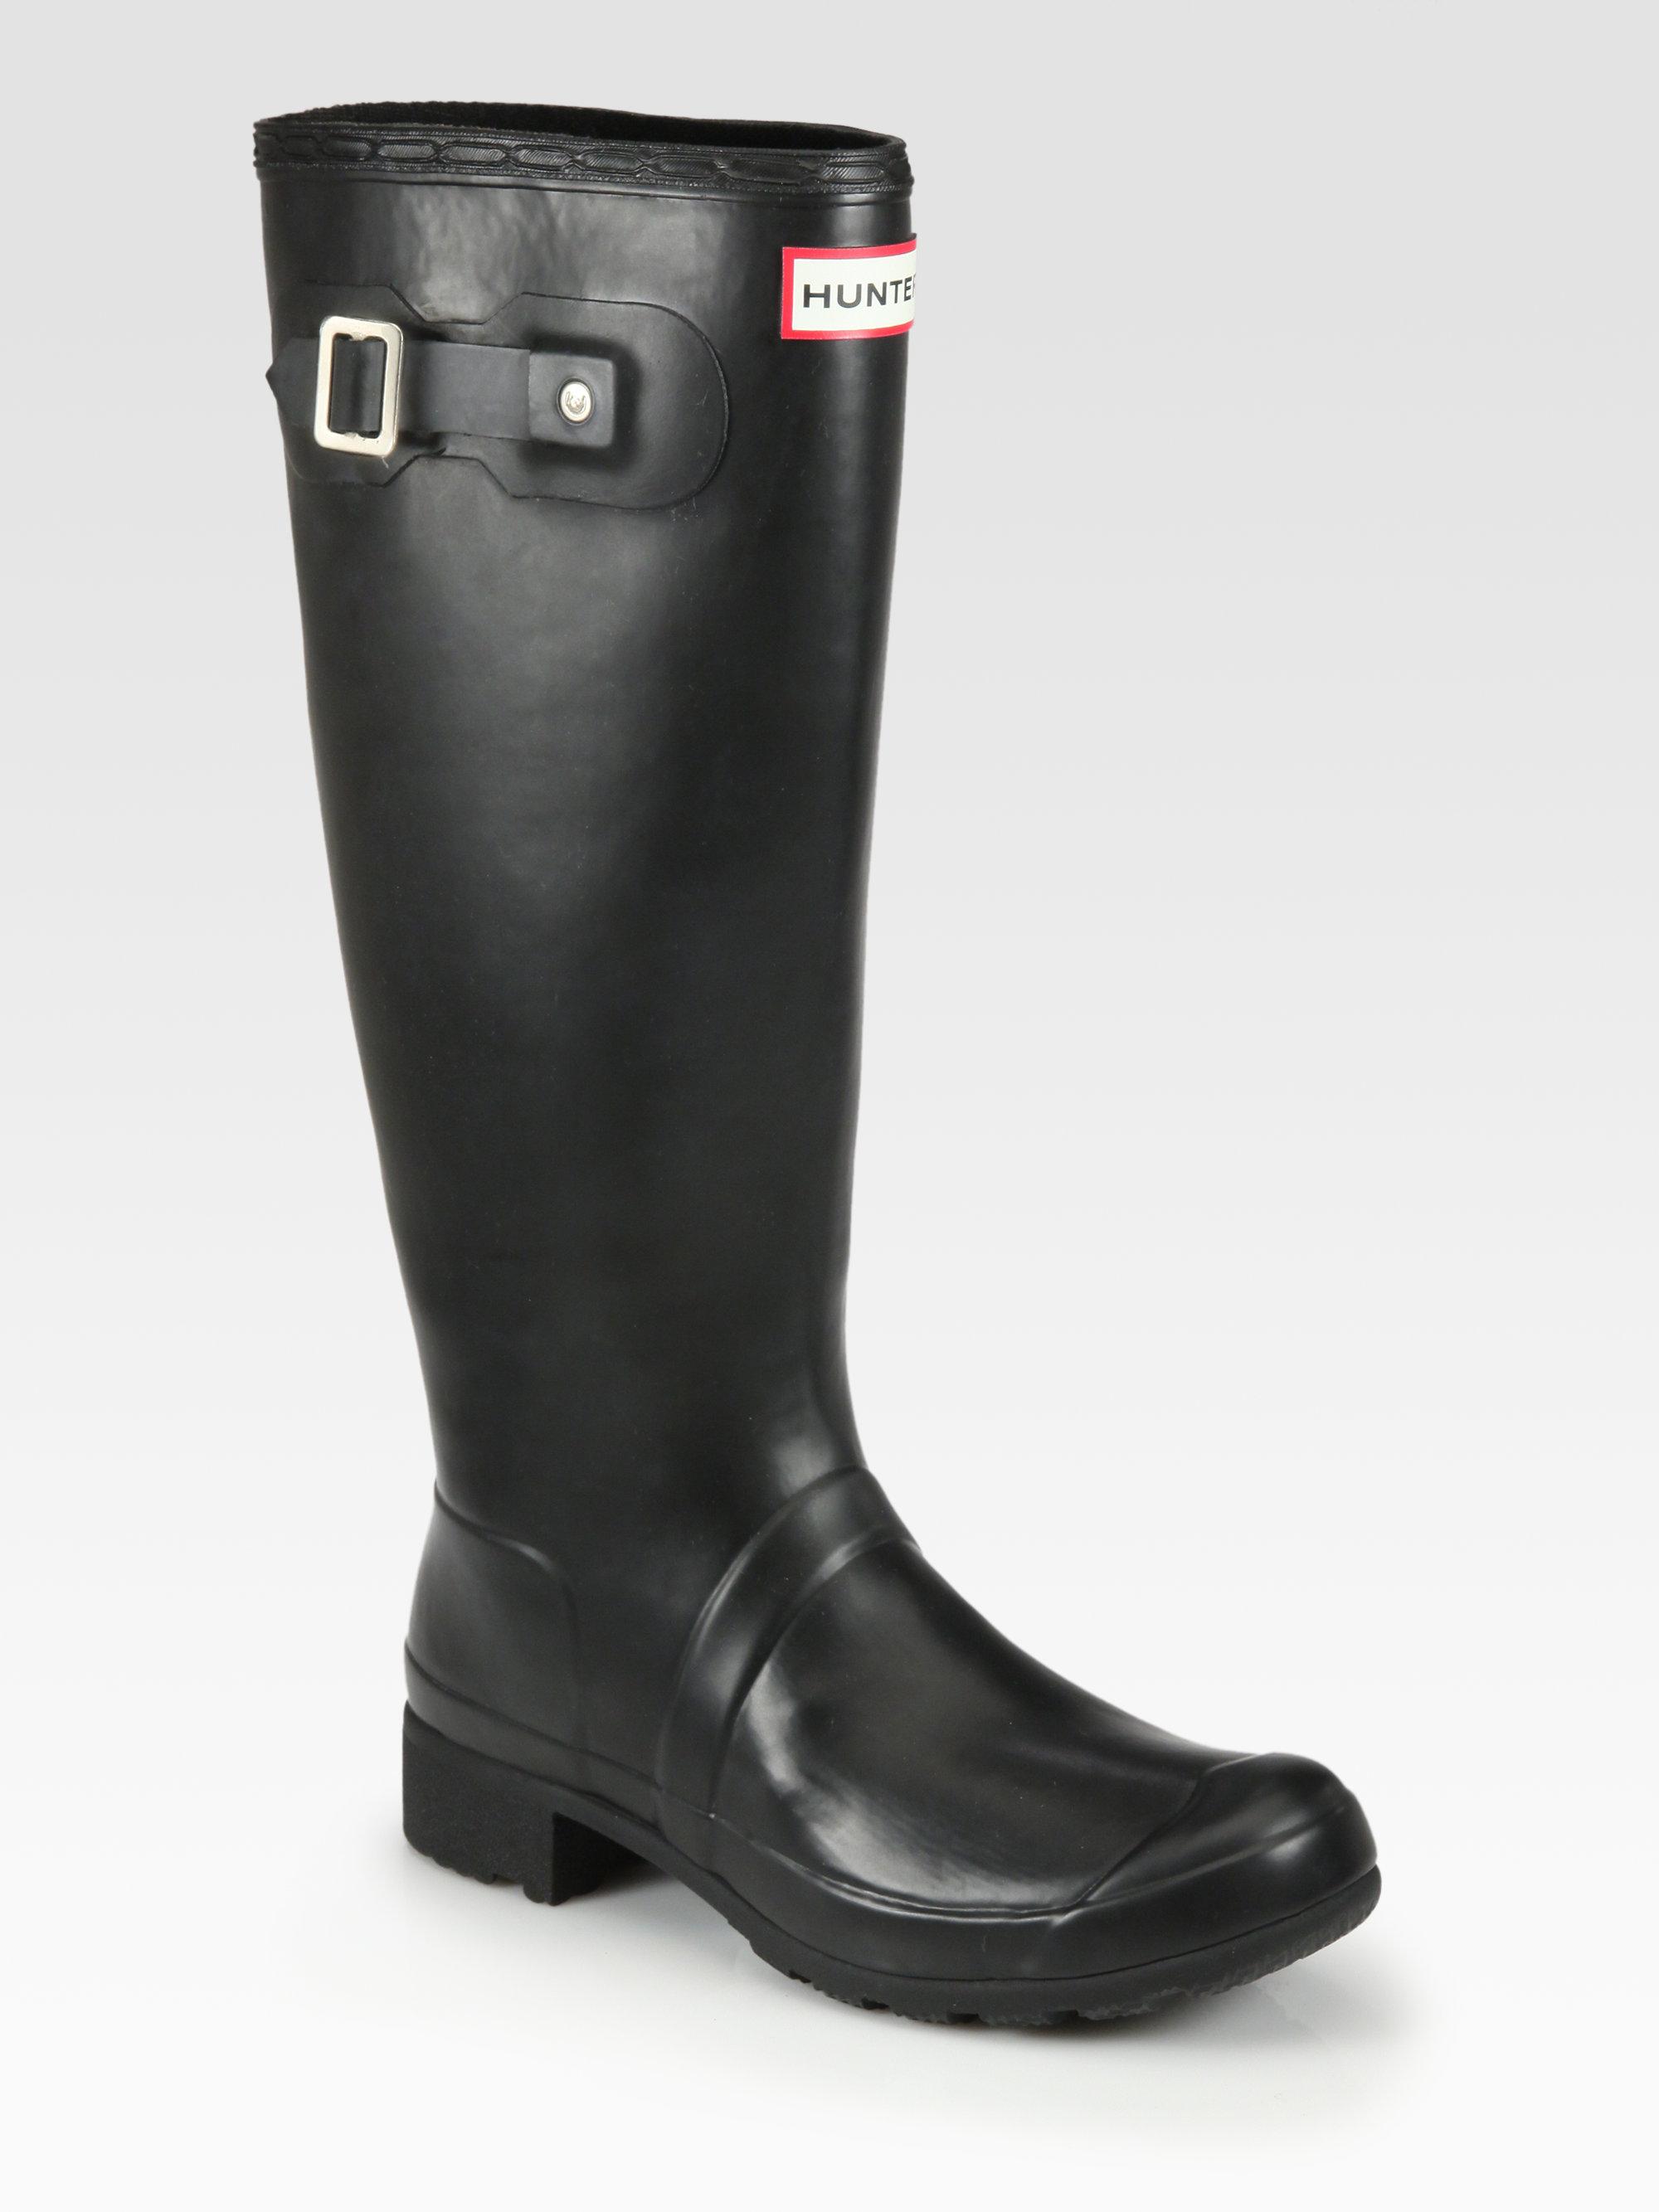 Hunter Original Tour Packable Rain Boots in Black | Lyst